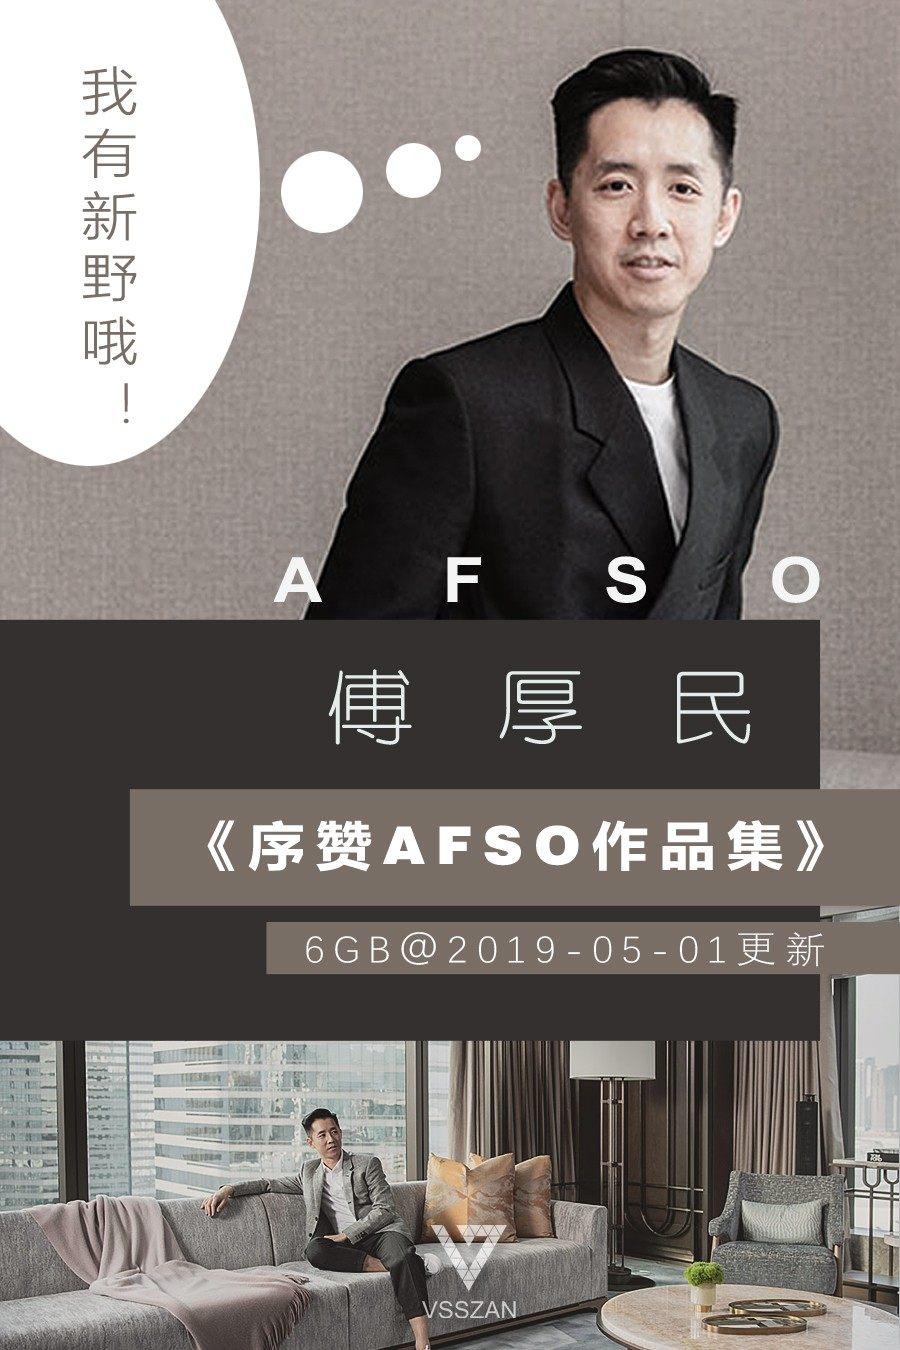 ad_AFSO20190501-2.jpg